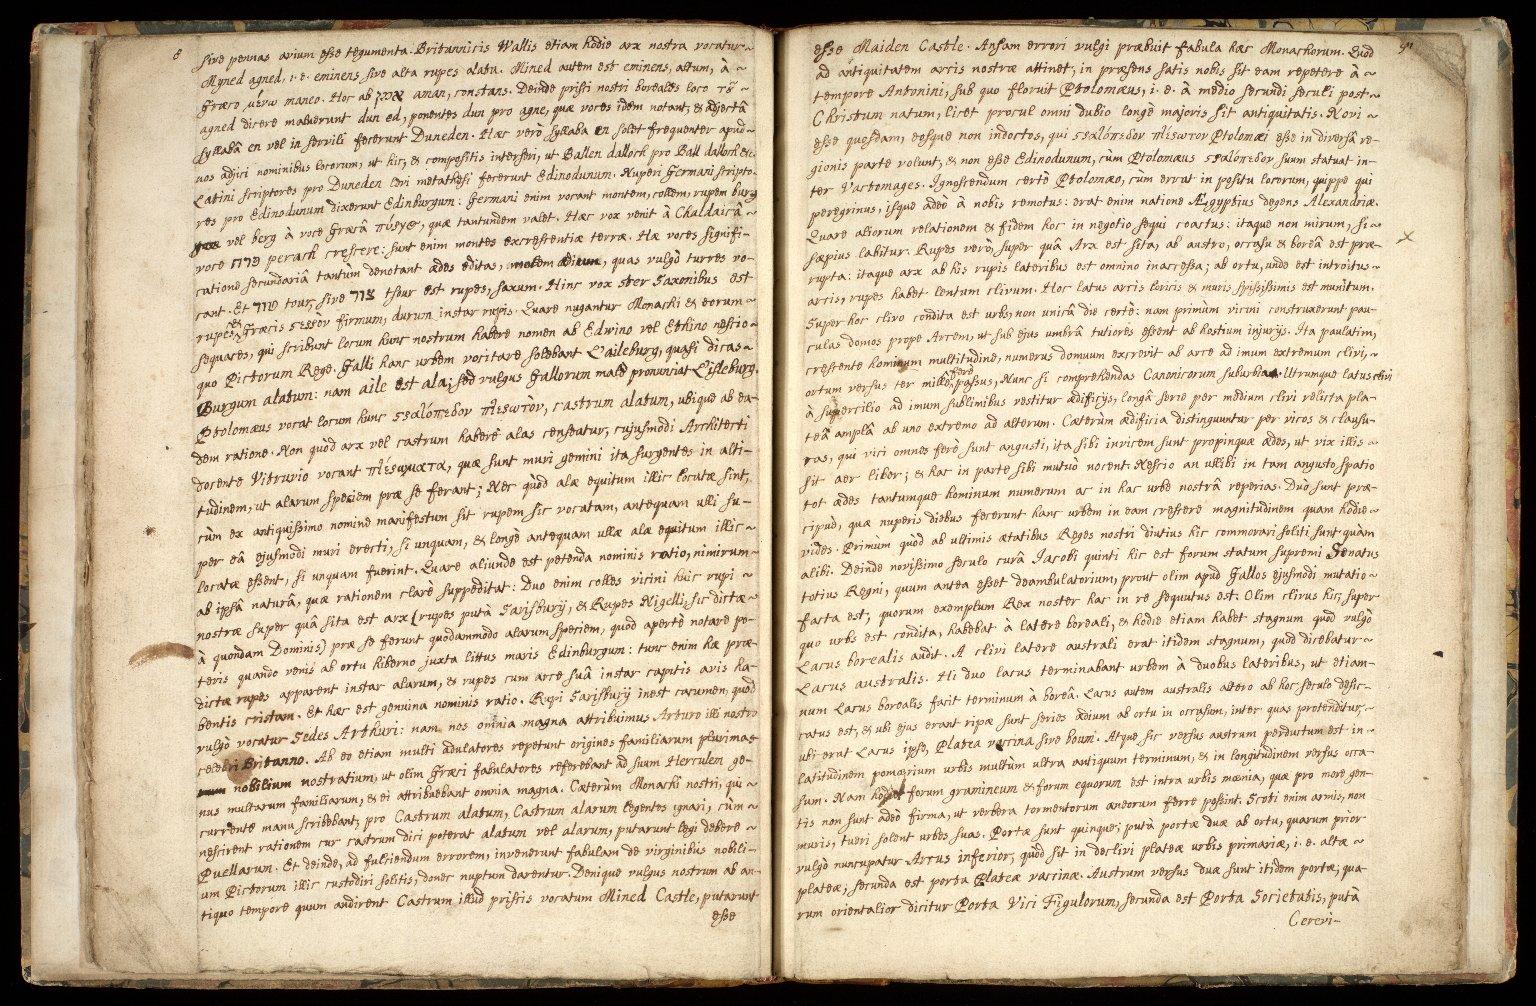 Provincia Edinburgena descriptio. [6 of 7]